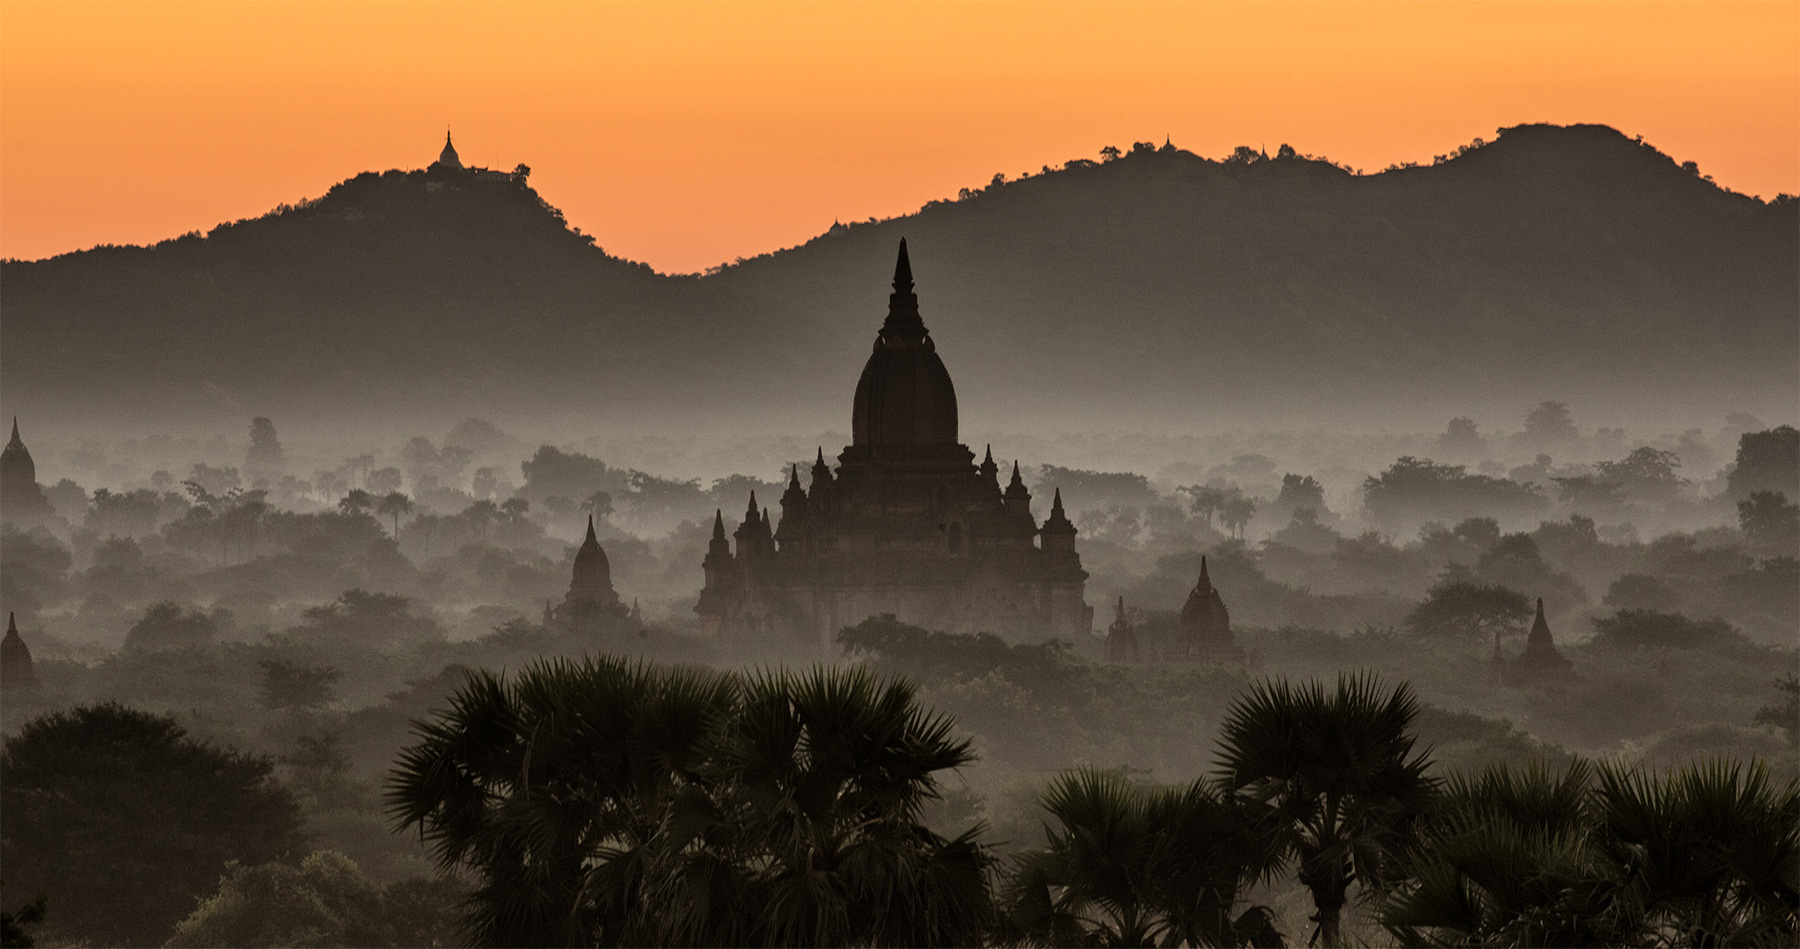 bagan_burma_myanmar_sunrise_temples_intro